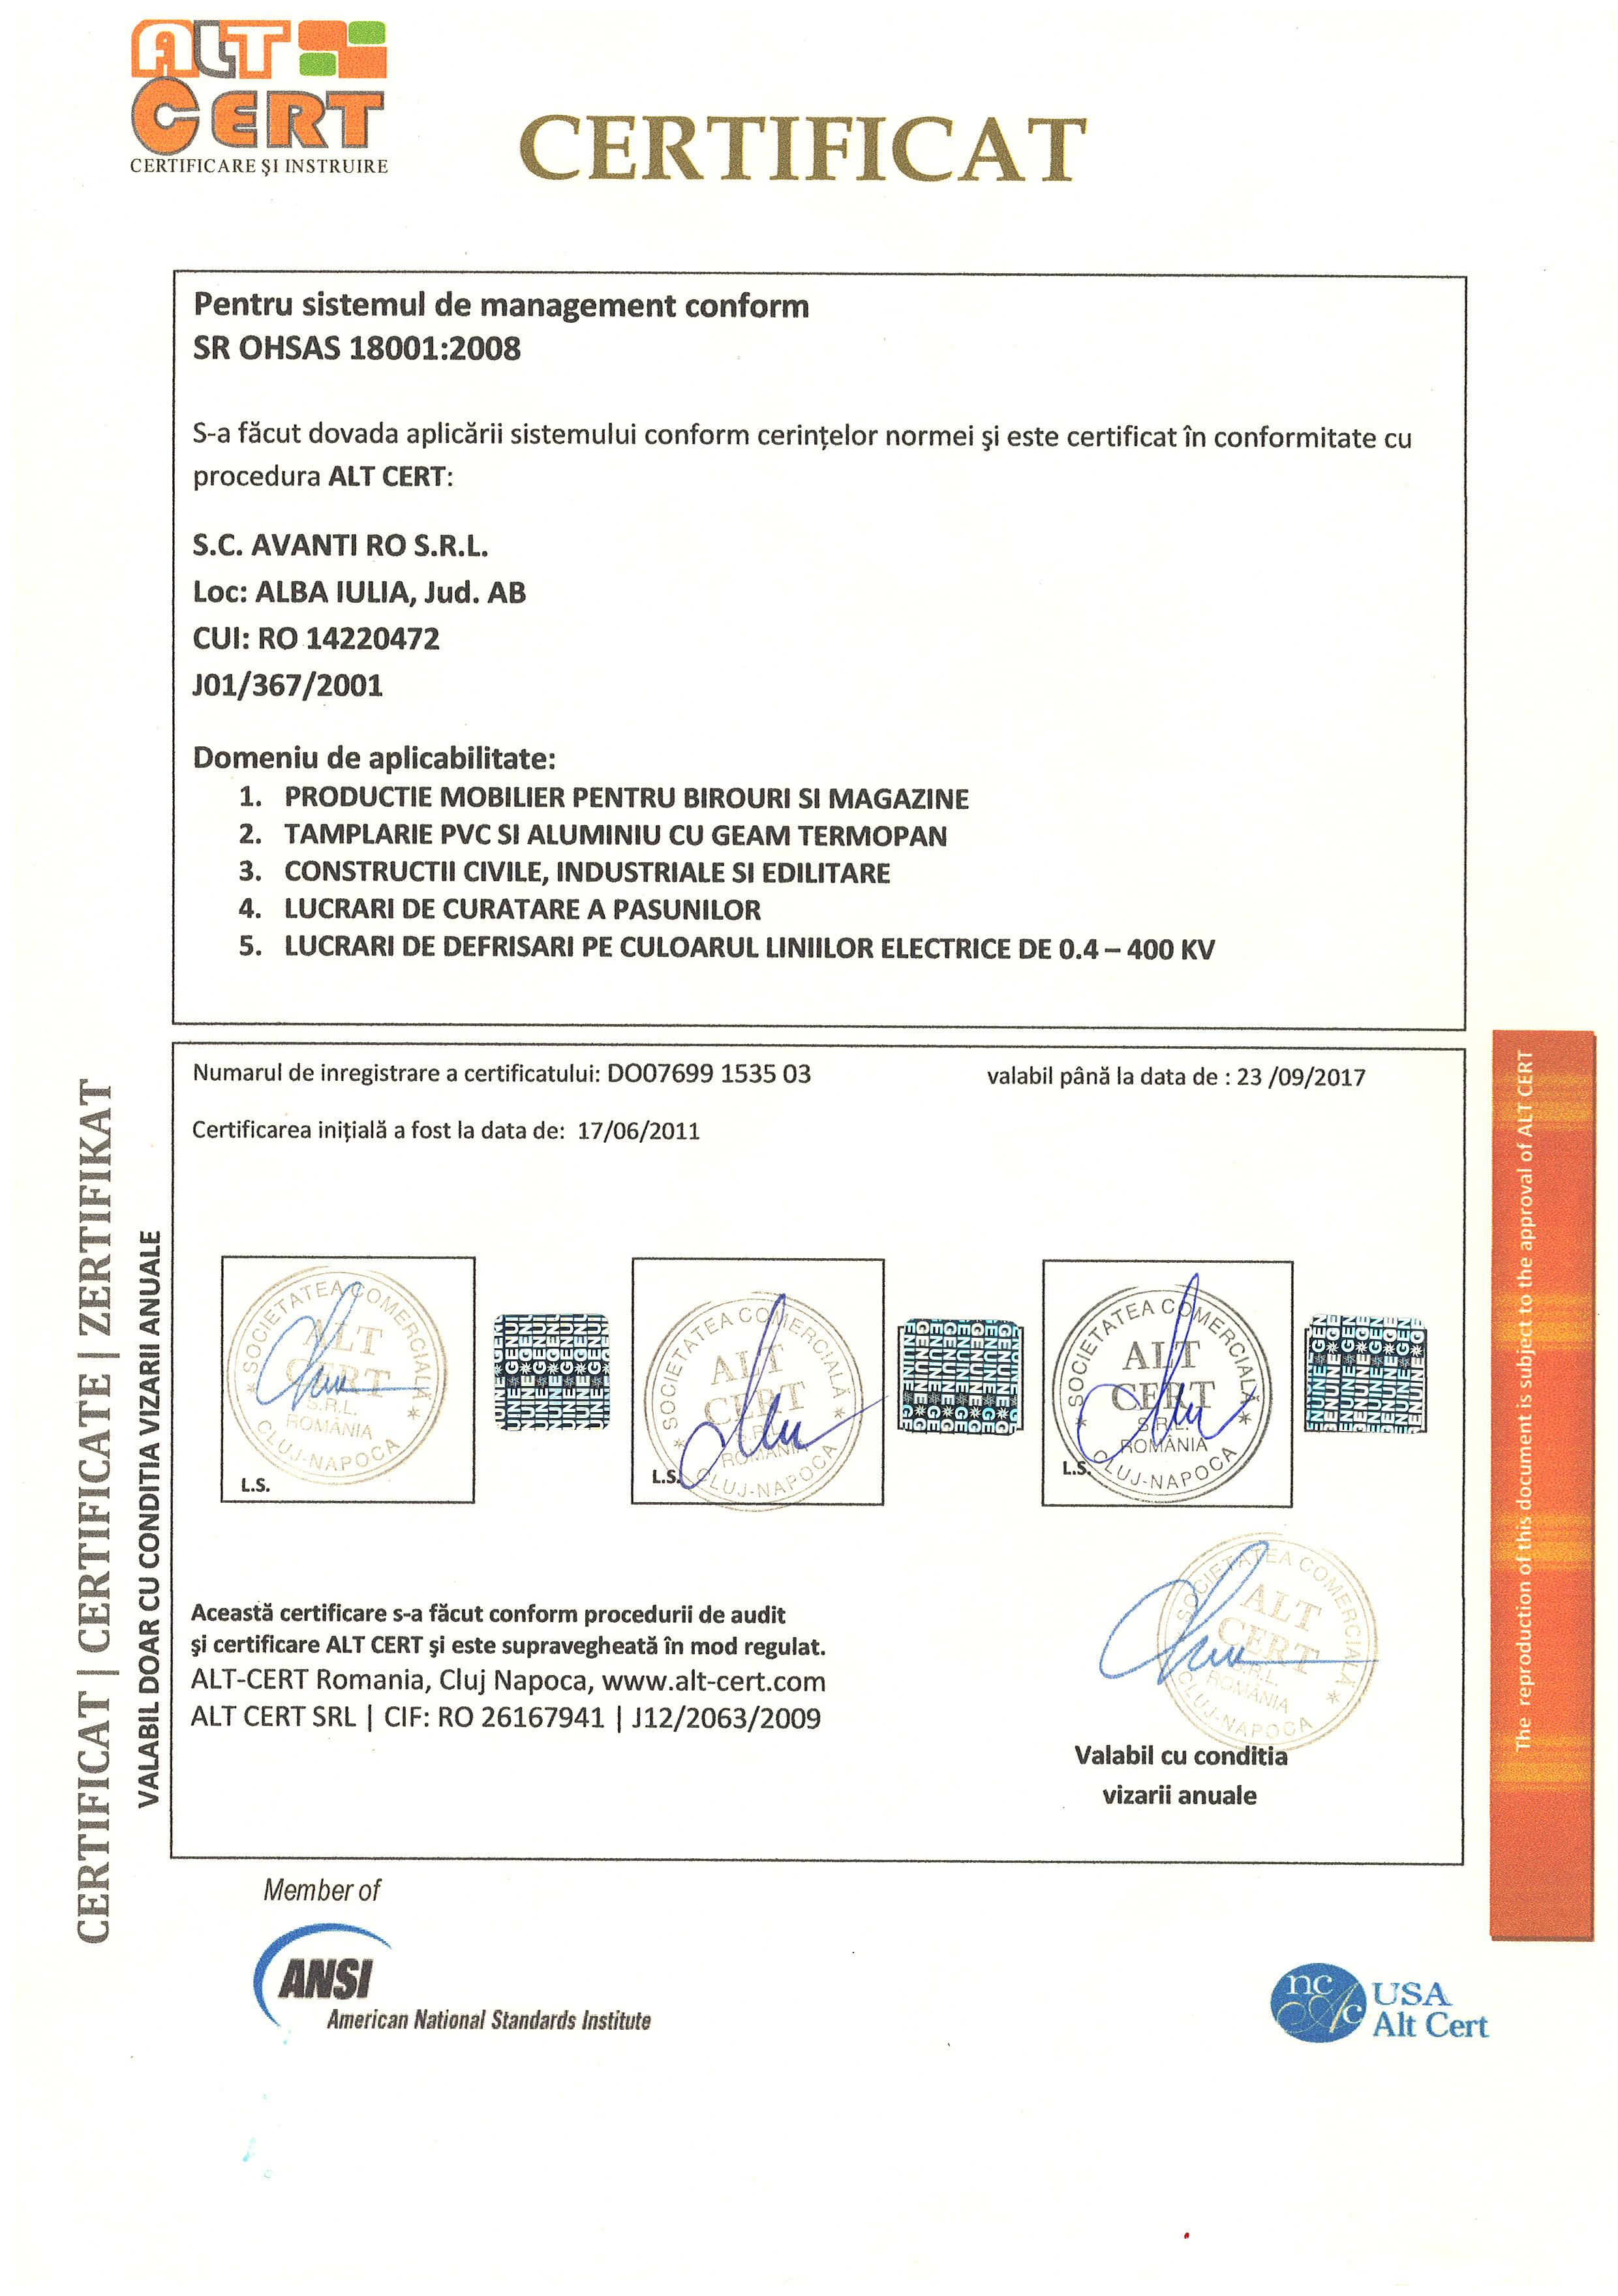 ISO 18001 AVANTI ROMANIA